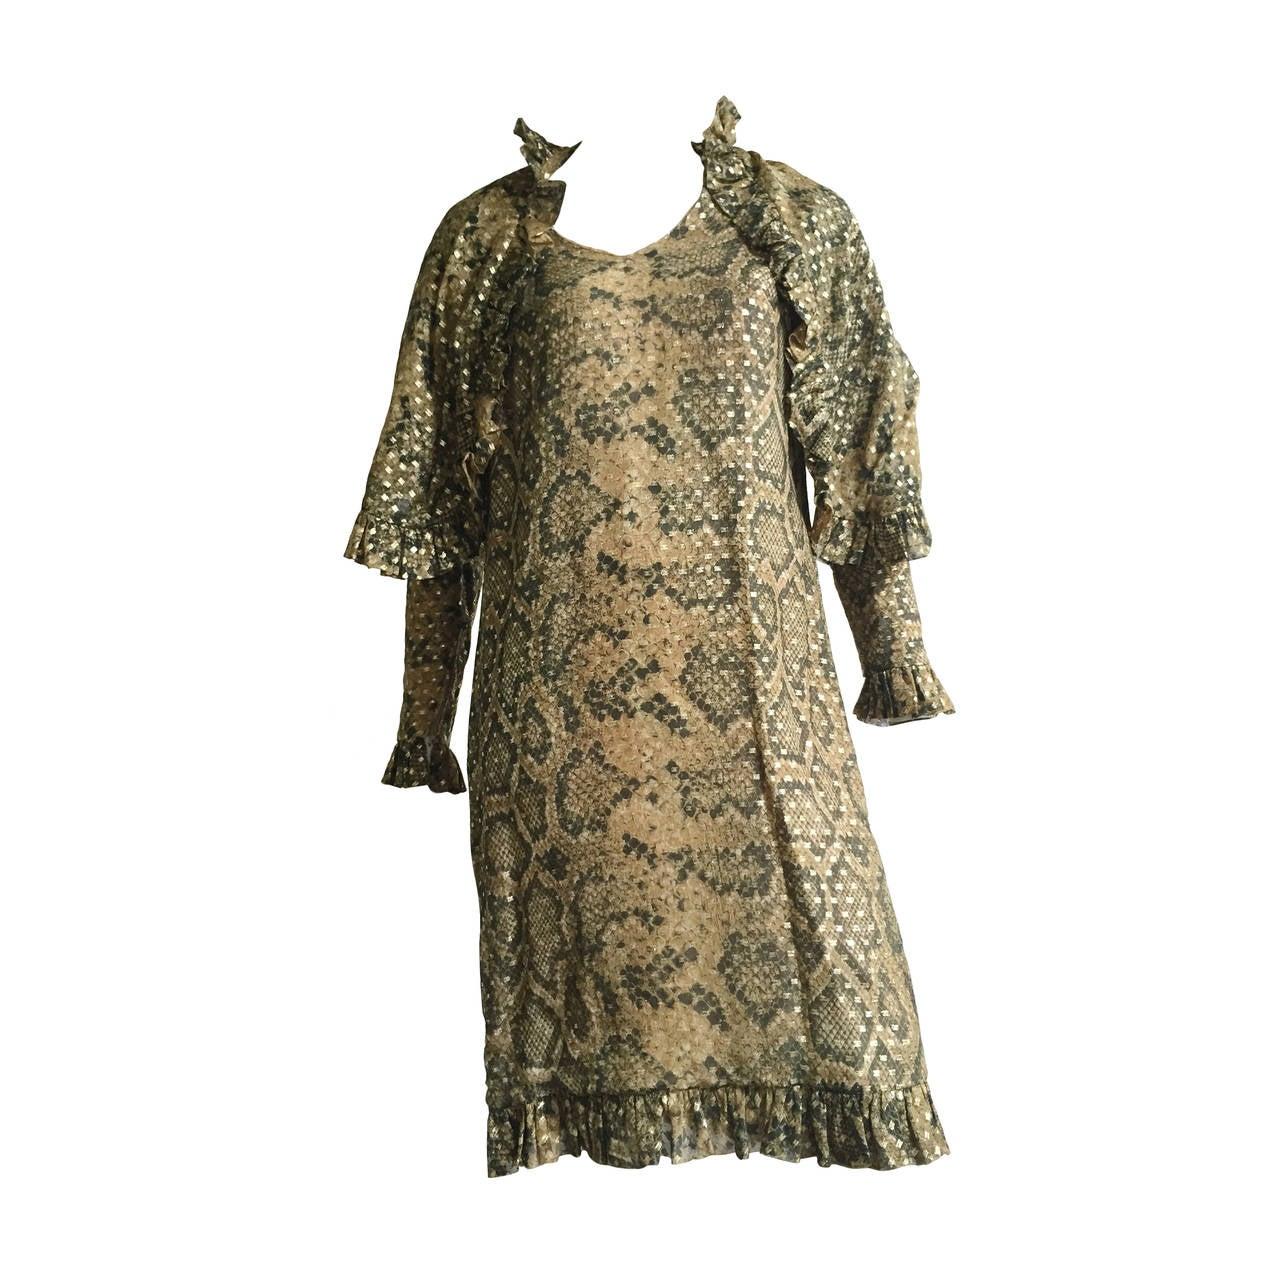 Bill Blass 70s Silk Dress Size 12.